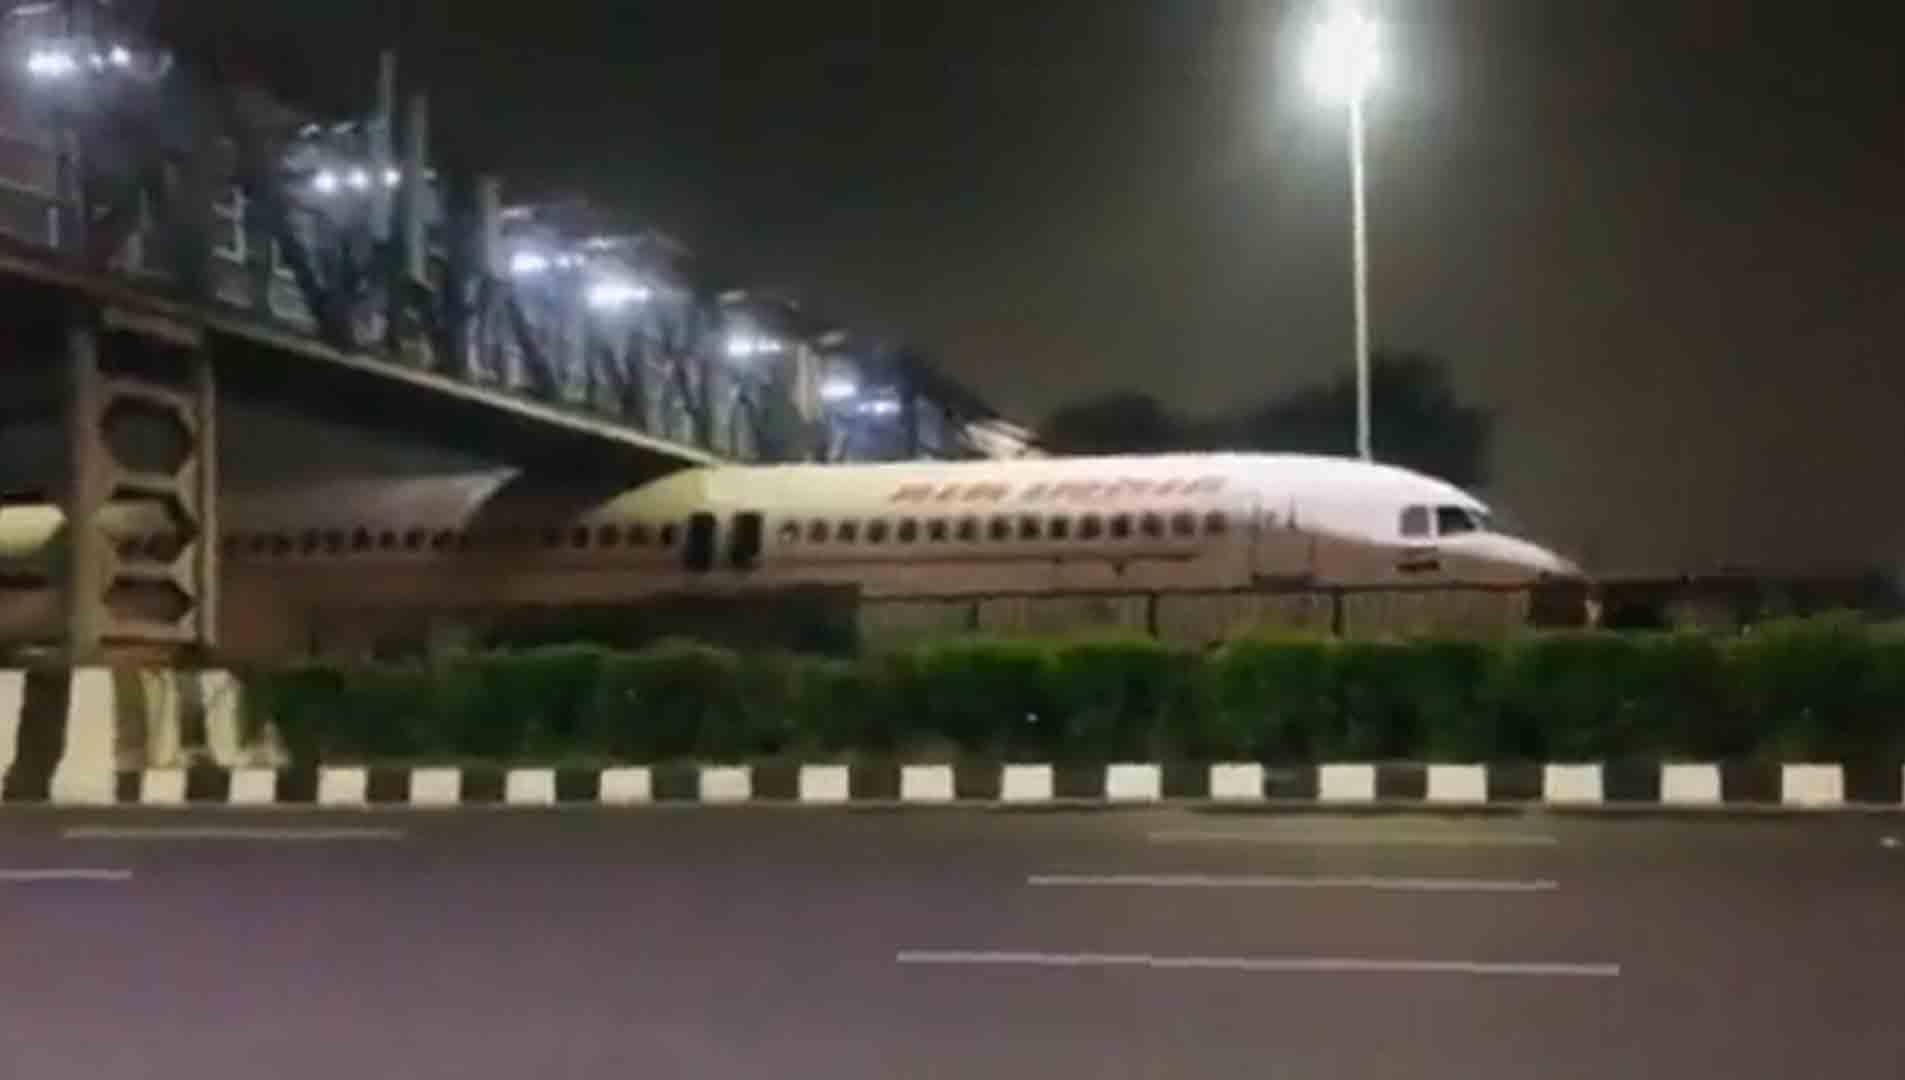 Vídeo de avião preso sob ponte, viraliza nas redes sociais. Foto: Reprodução Twitter